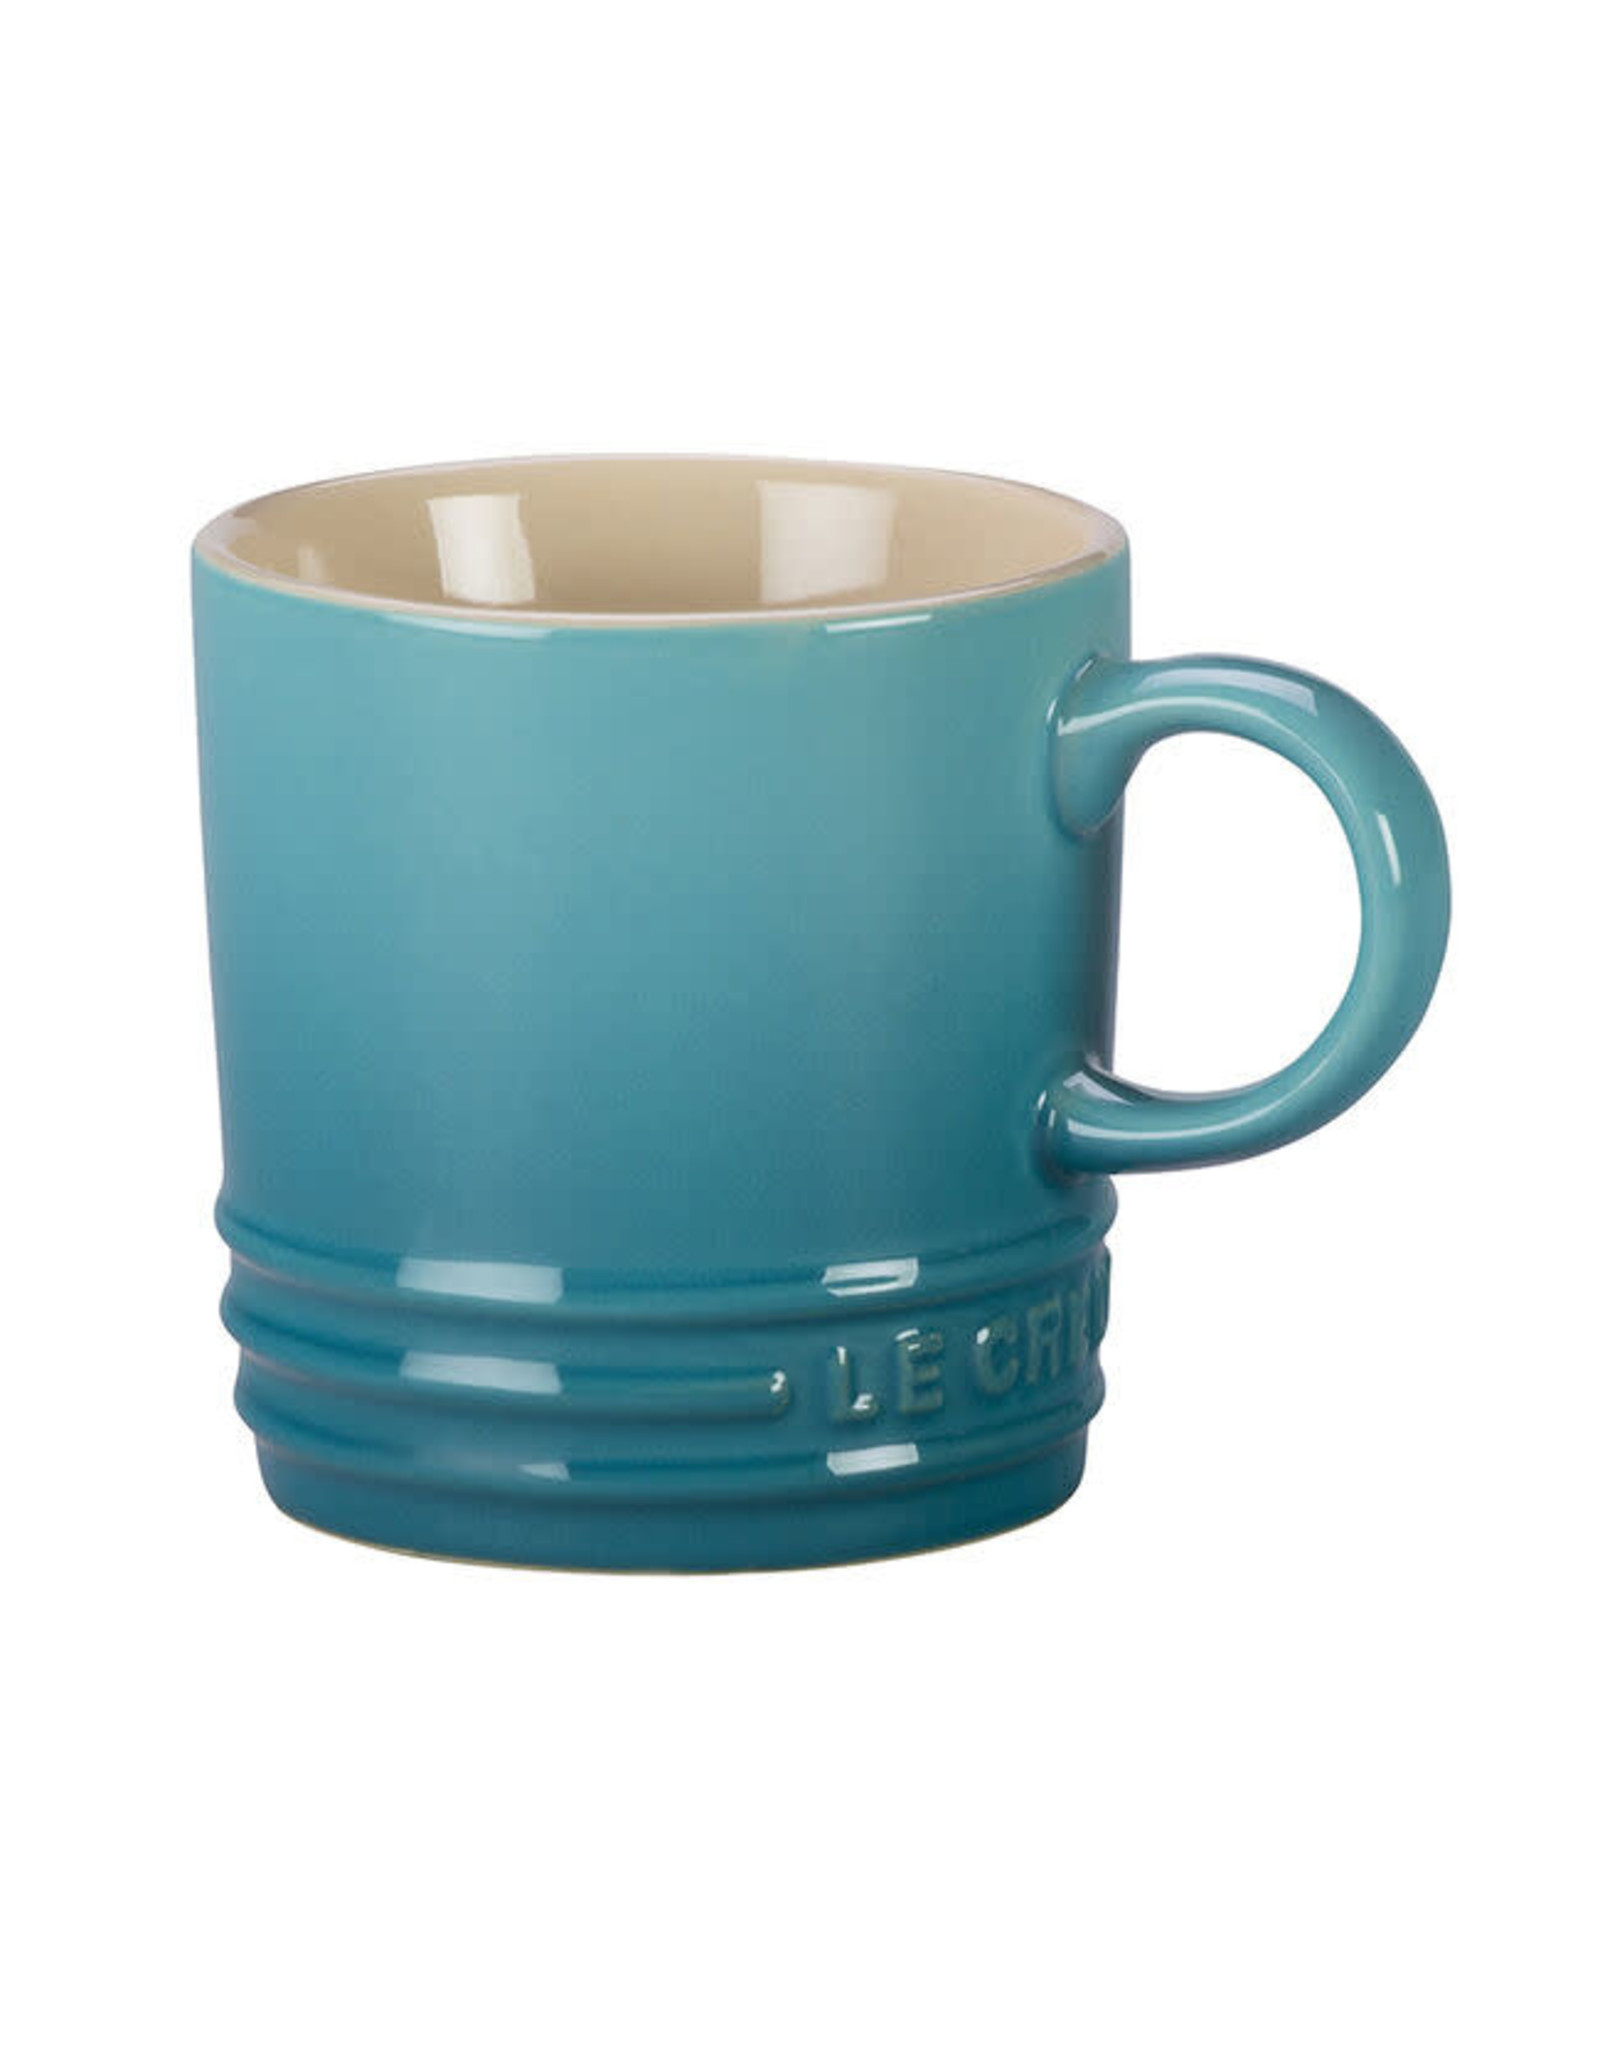 Le Creuset LE CREUSET- Espresso Mug 3oz Caribbean